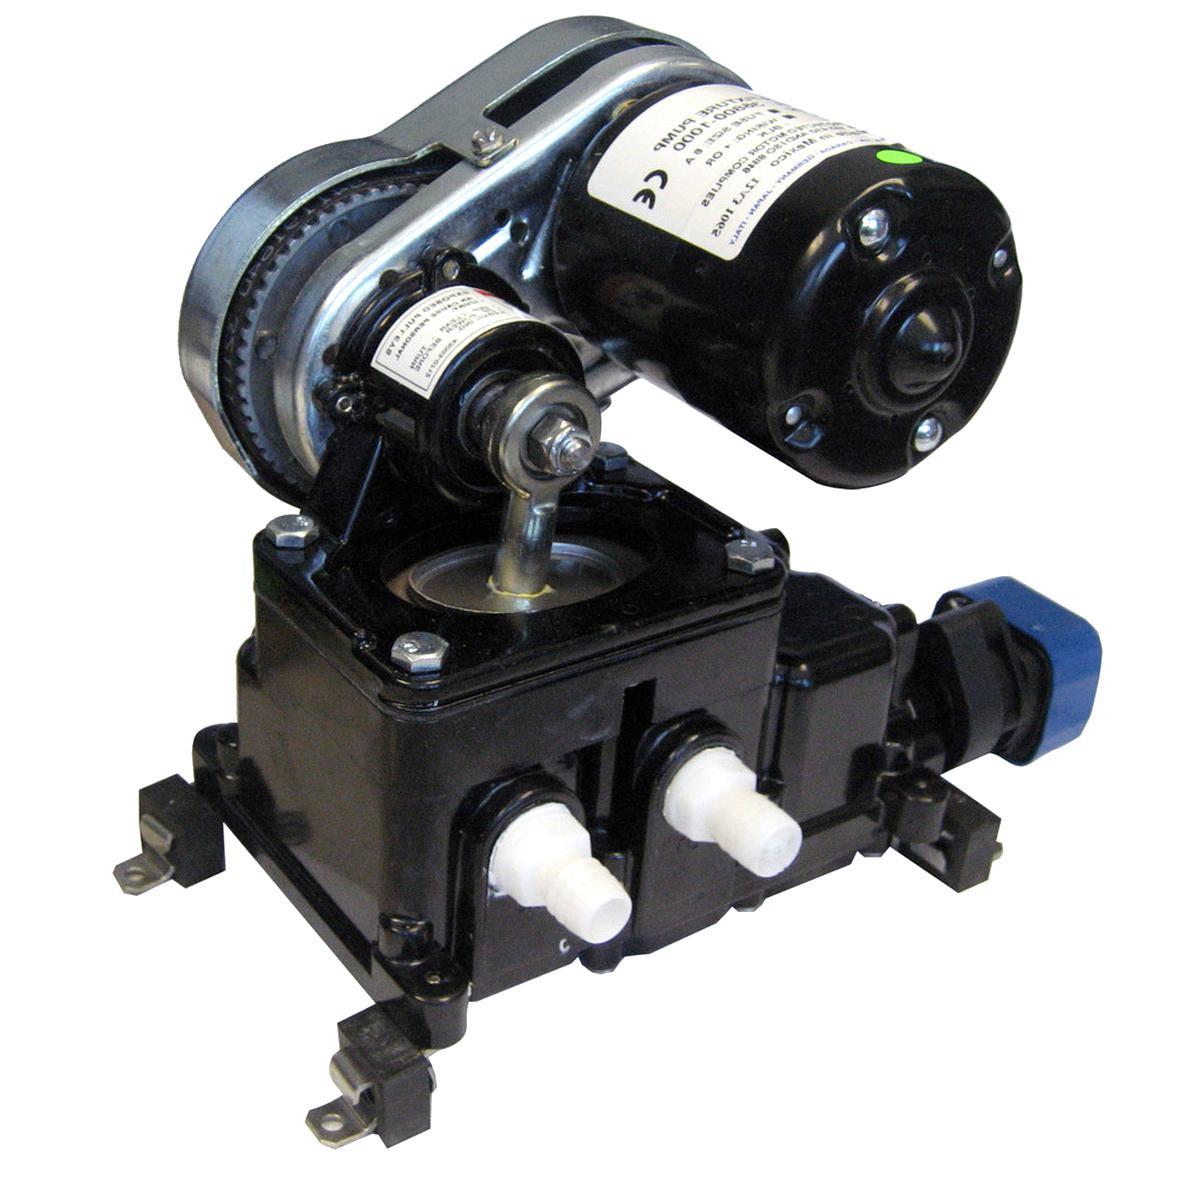 jabsco water pump for sale